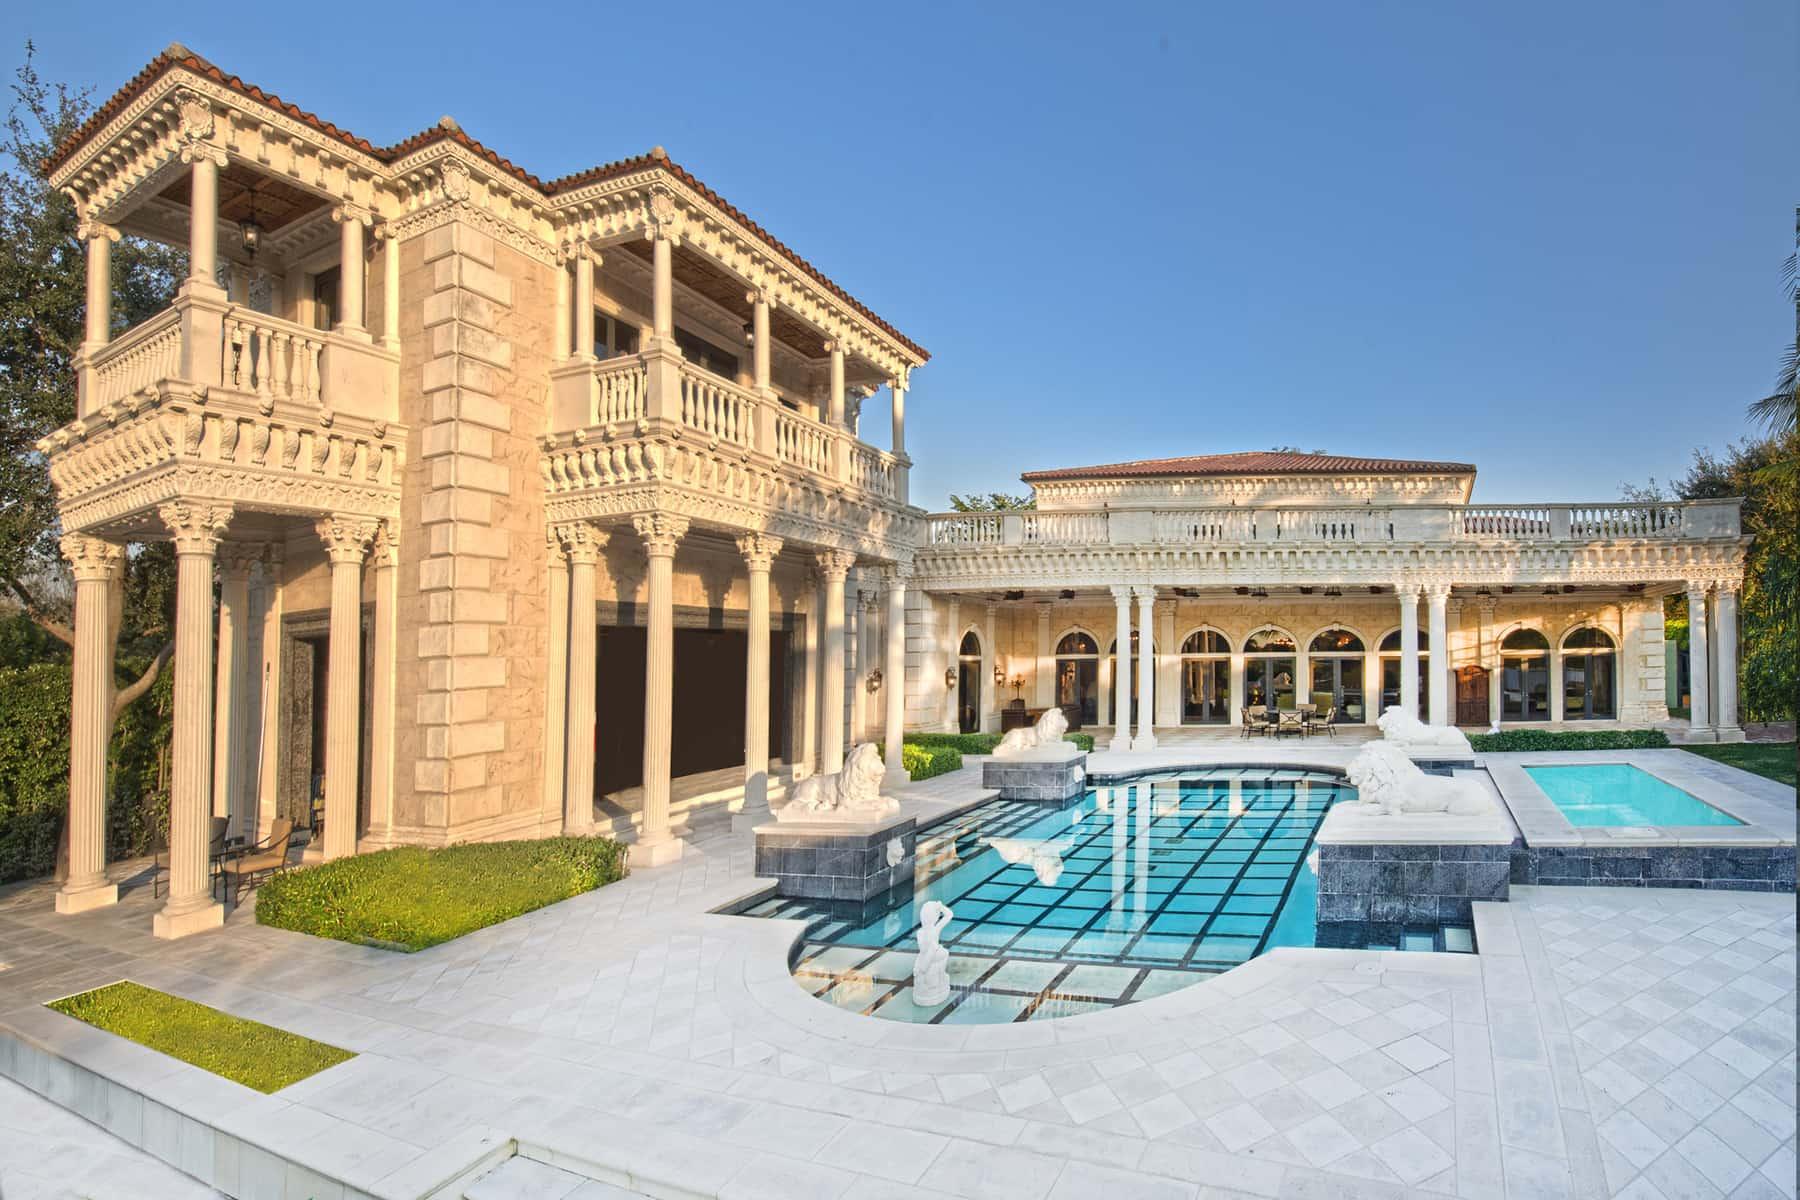 Palazzo grande brings the grandeur of the italian Italian restaurants palm beach gardens